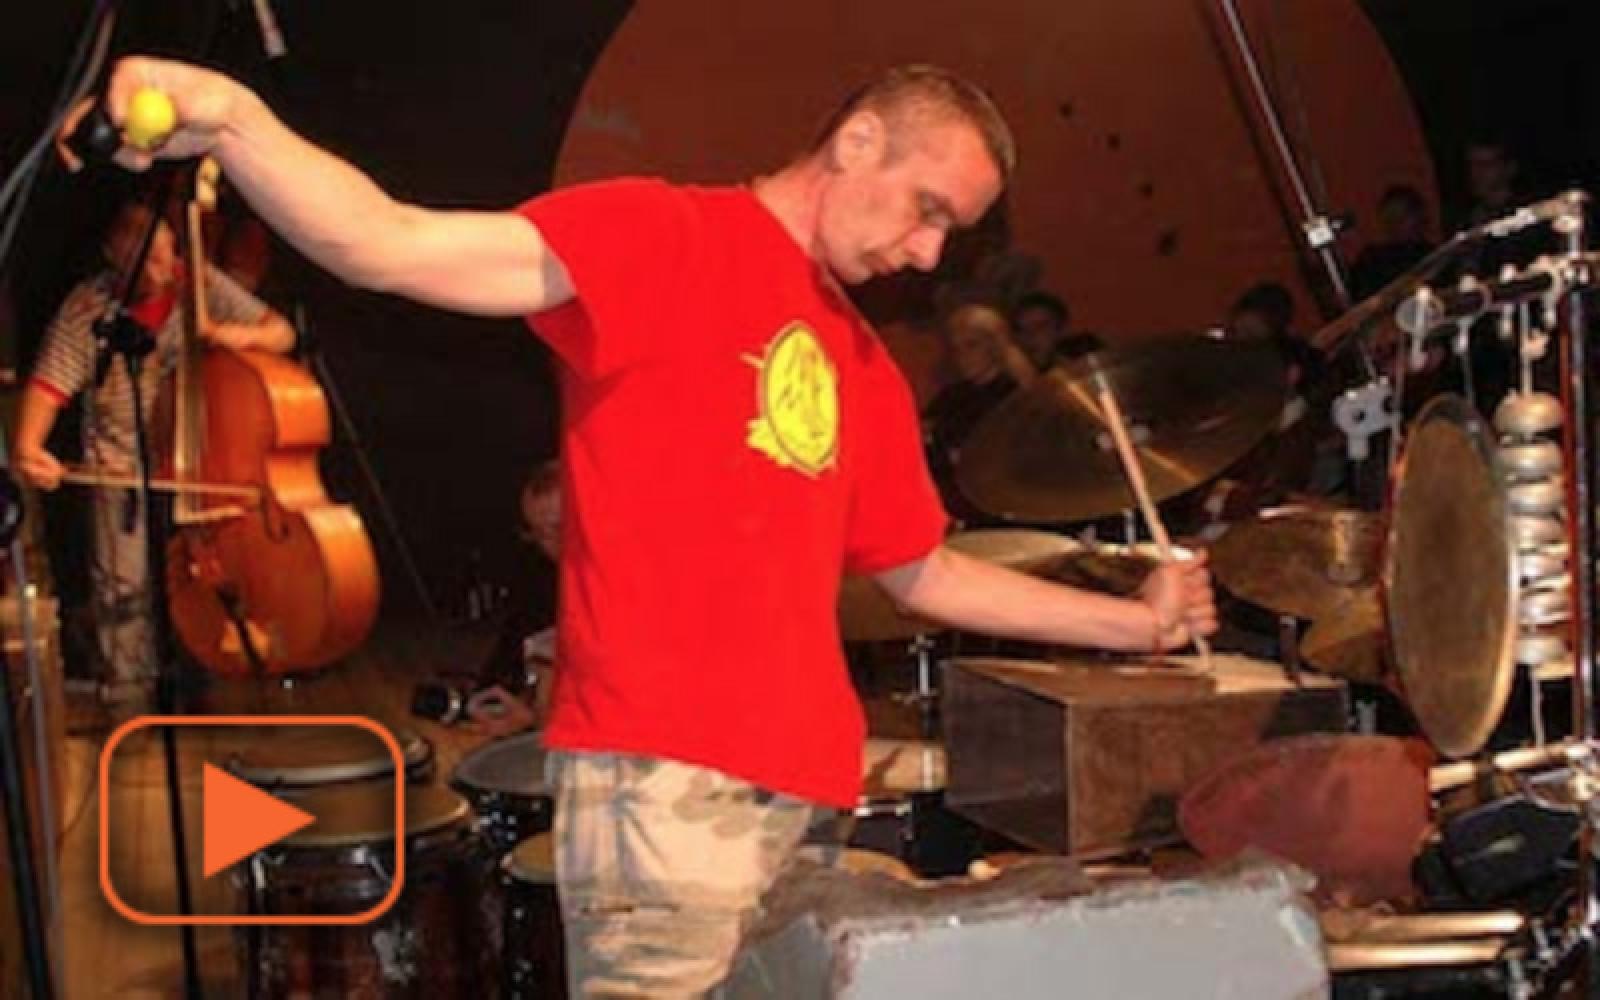 Gendos / Mazzoll / Janicki / Majewski - fragment koncertu